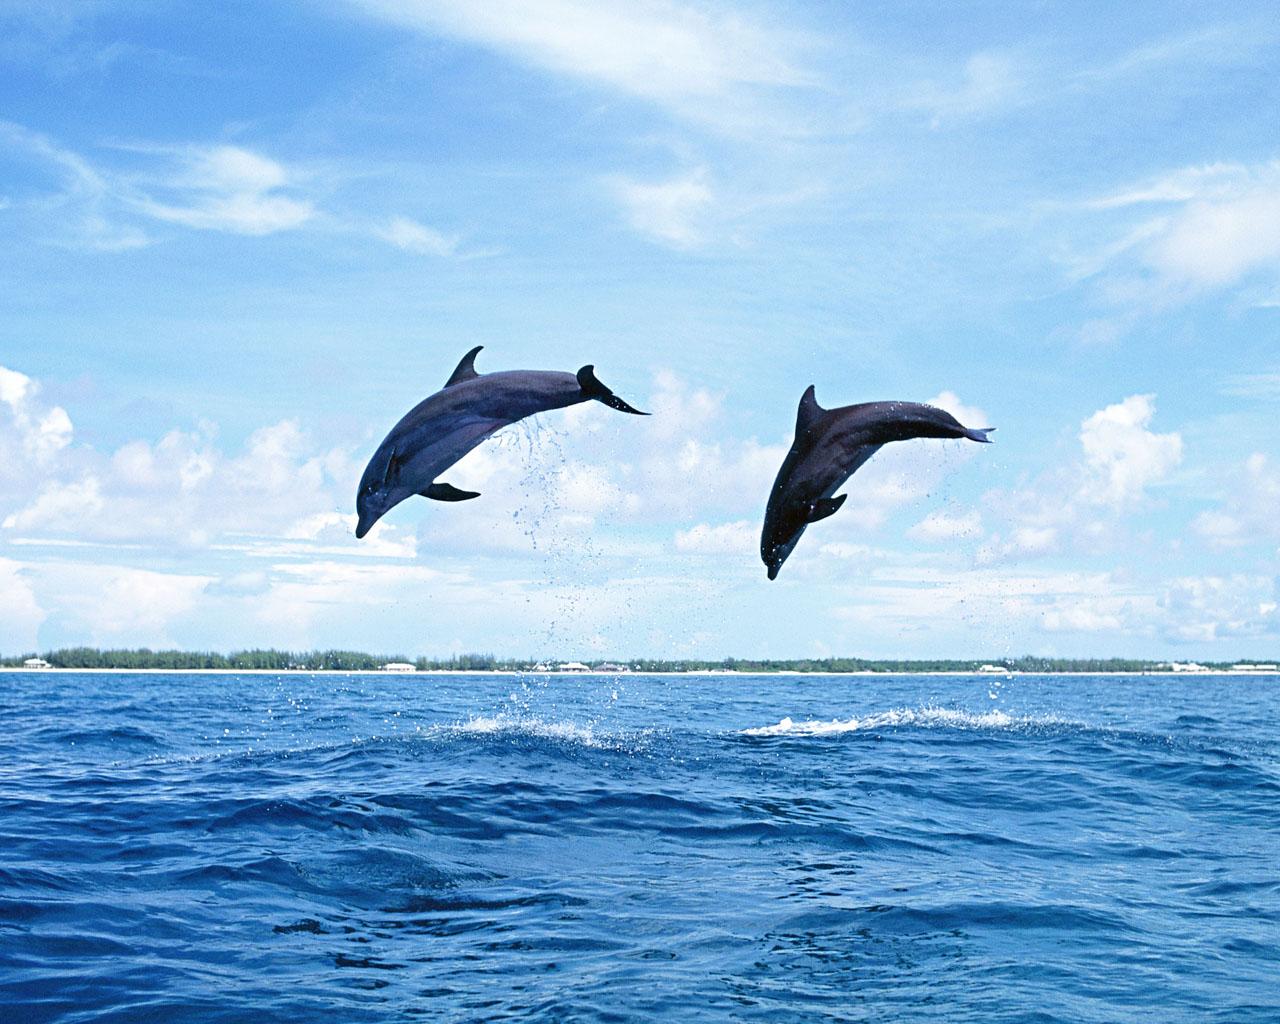 The best top desktop dolphin wallpapers hd dolphins wallpaper 17jpg 1280x1024